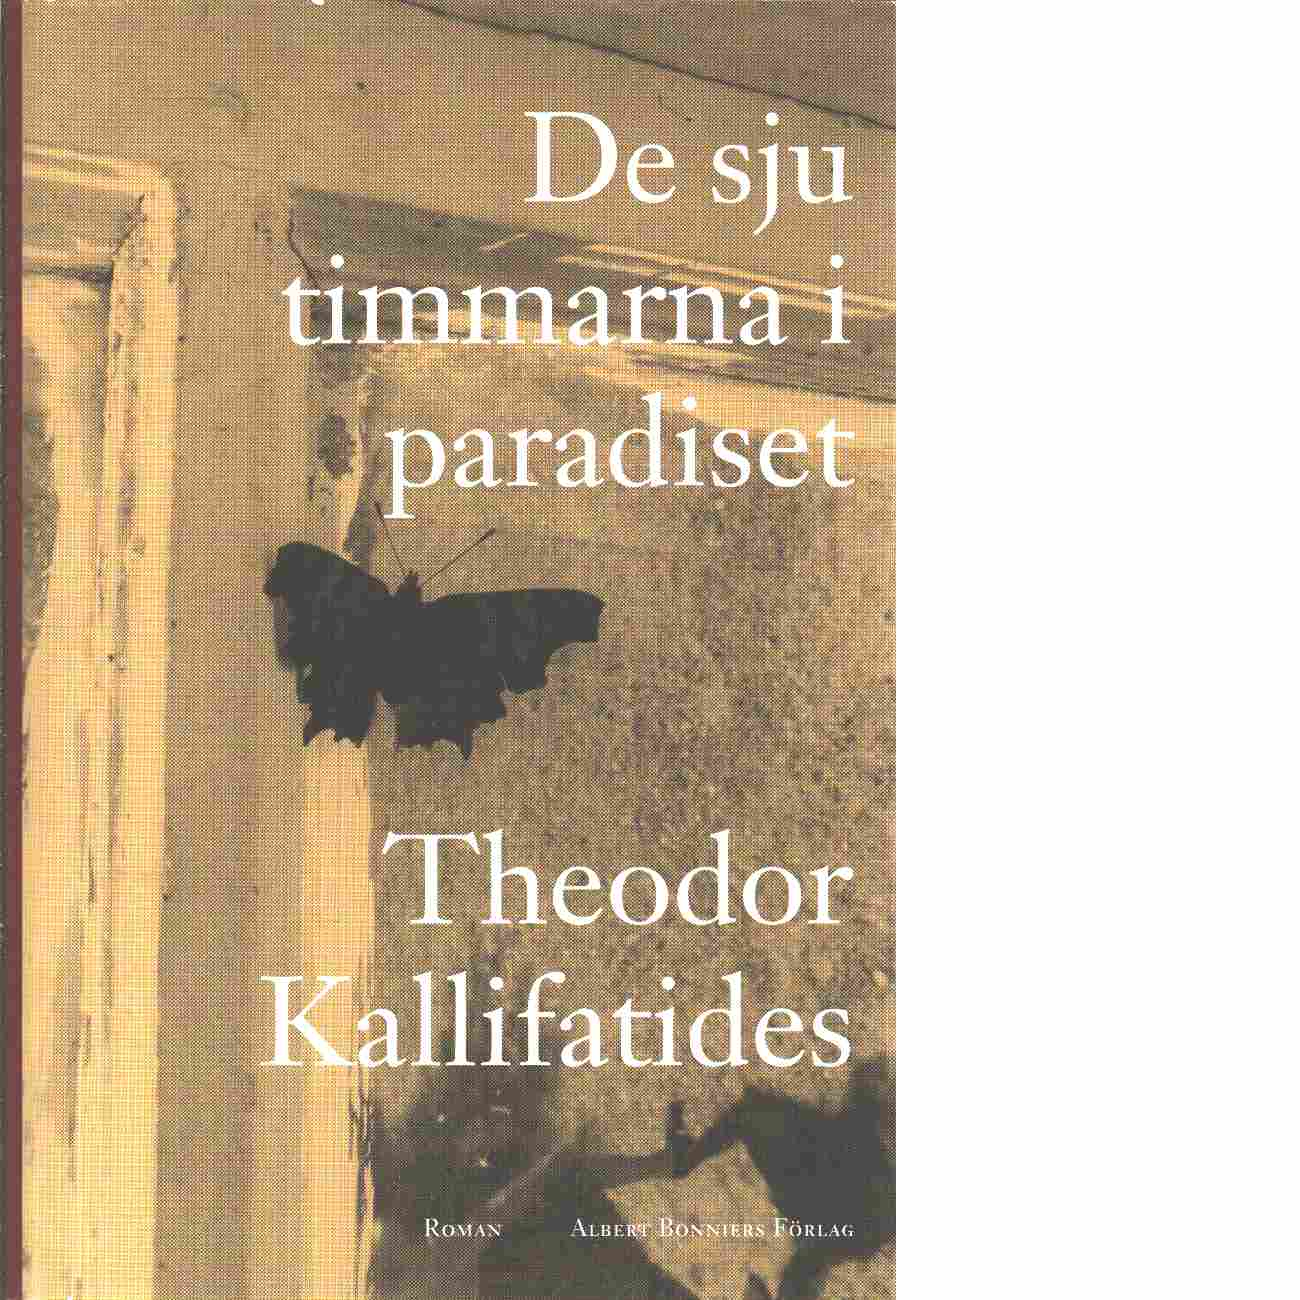 De sju timmarna i paradiset - Kallifatides, Theodor